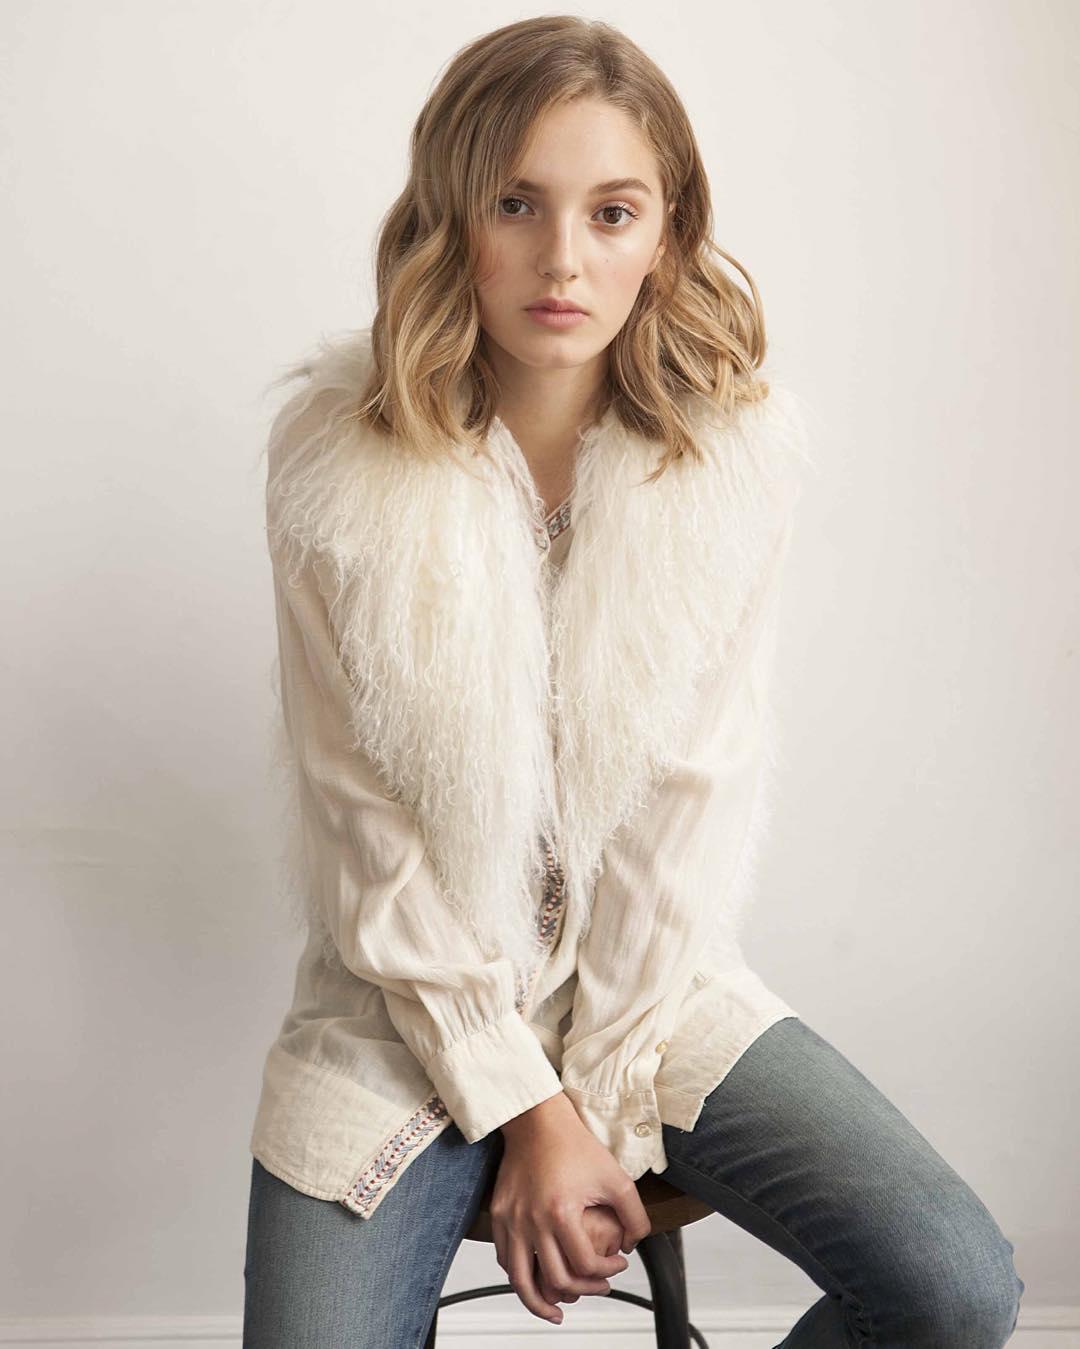 Kaitlyn-Bernard-4